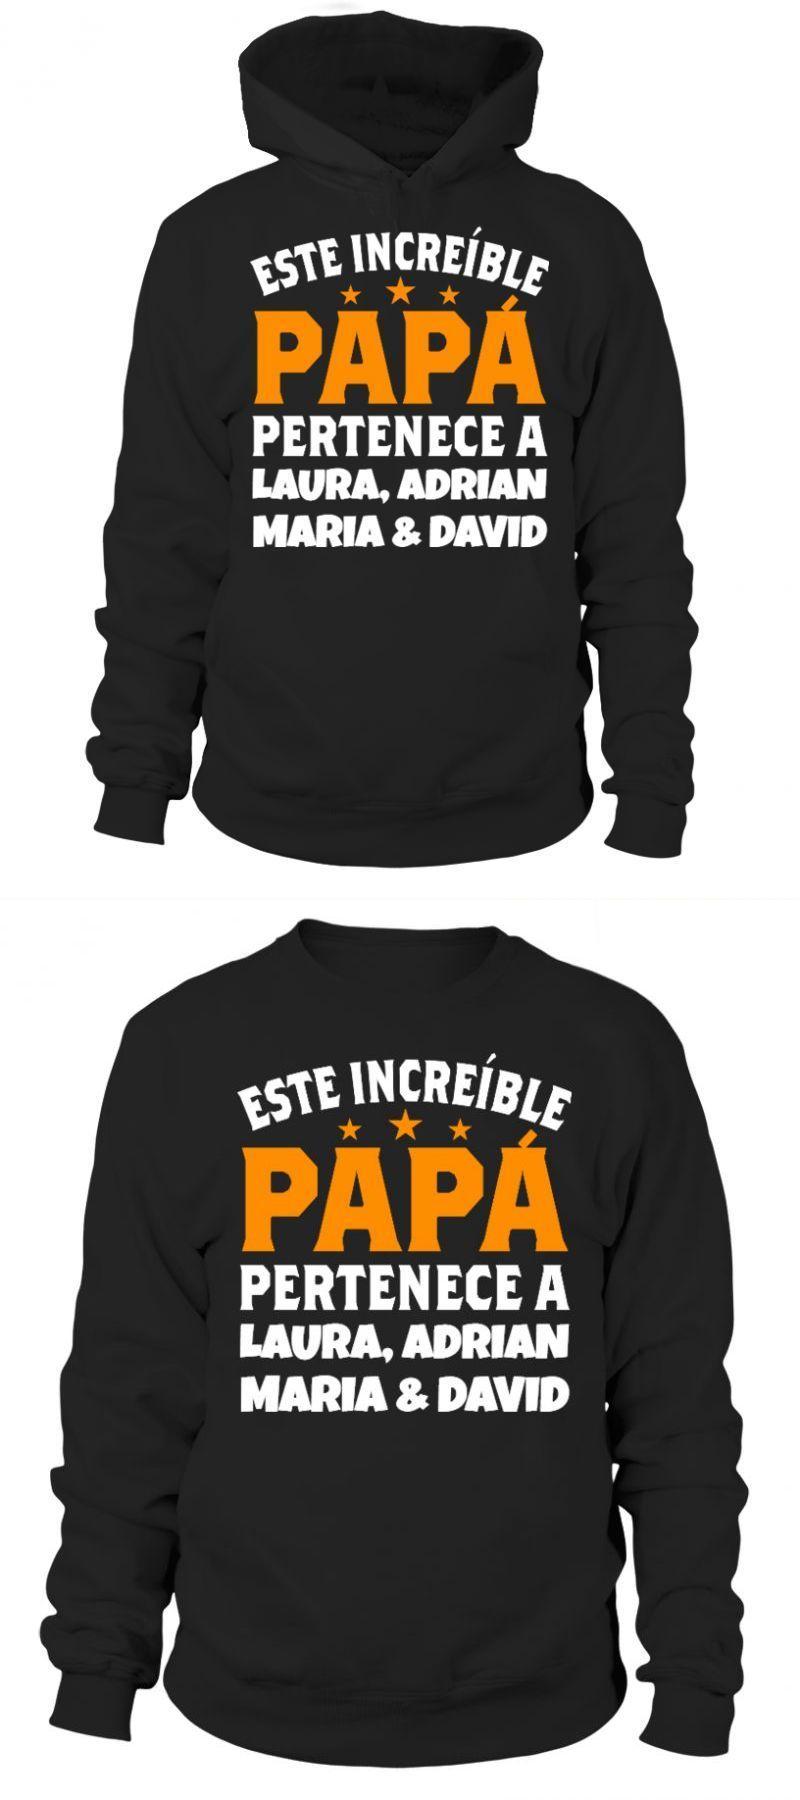 27bb4f7341 Este increÍble papÁ pertenece a camiseta personalizada kids t-shirt & dress  #este #